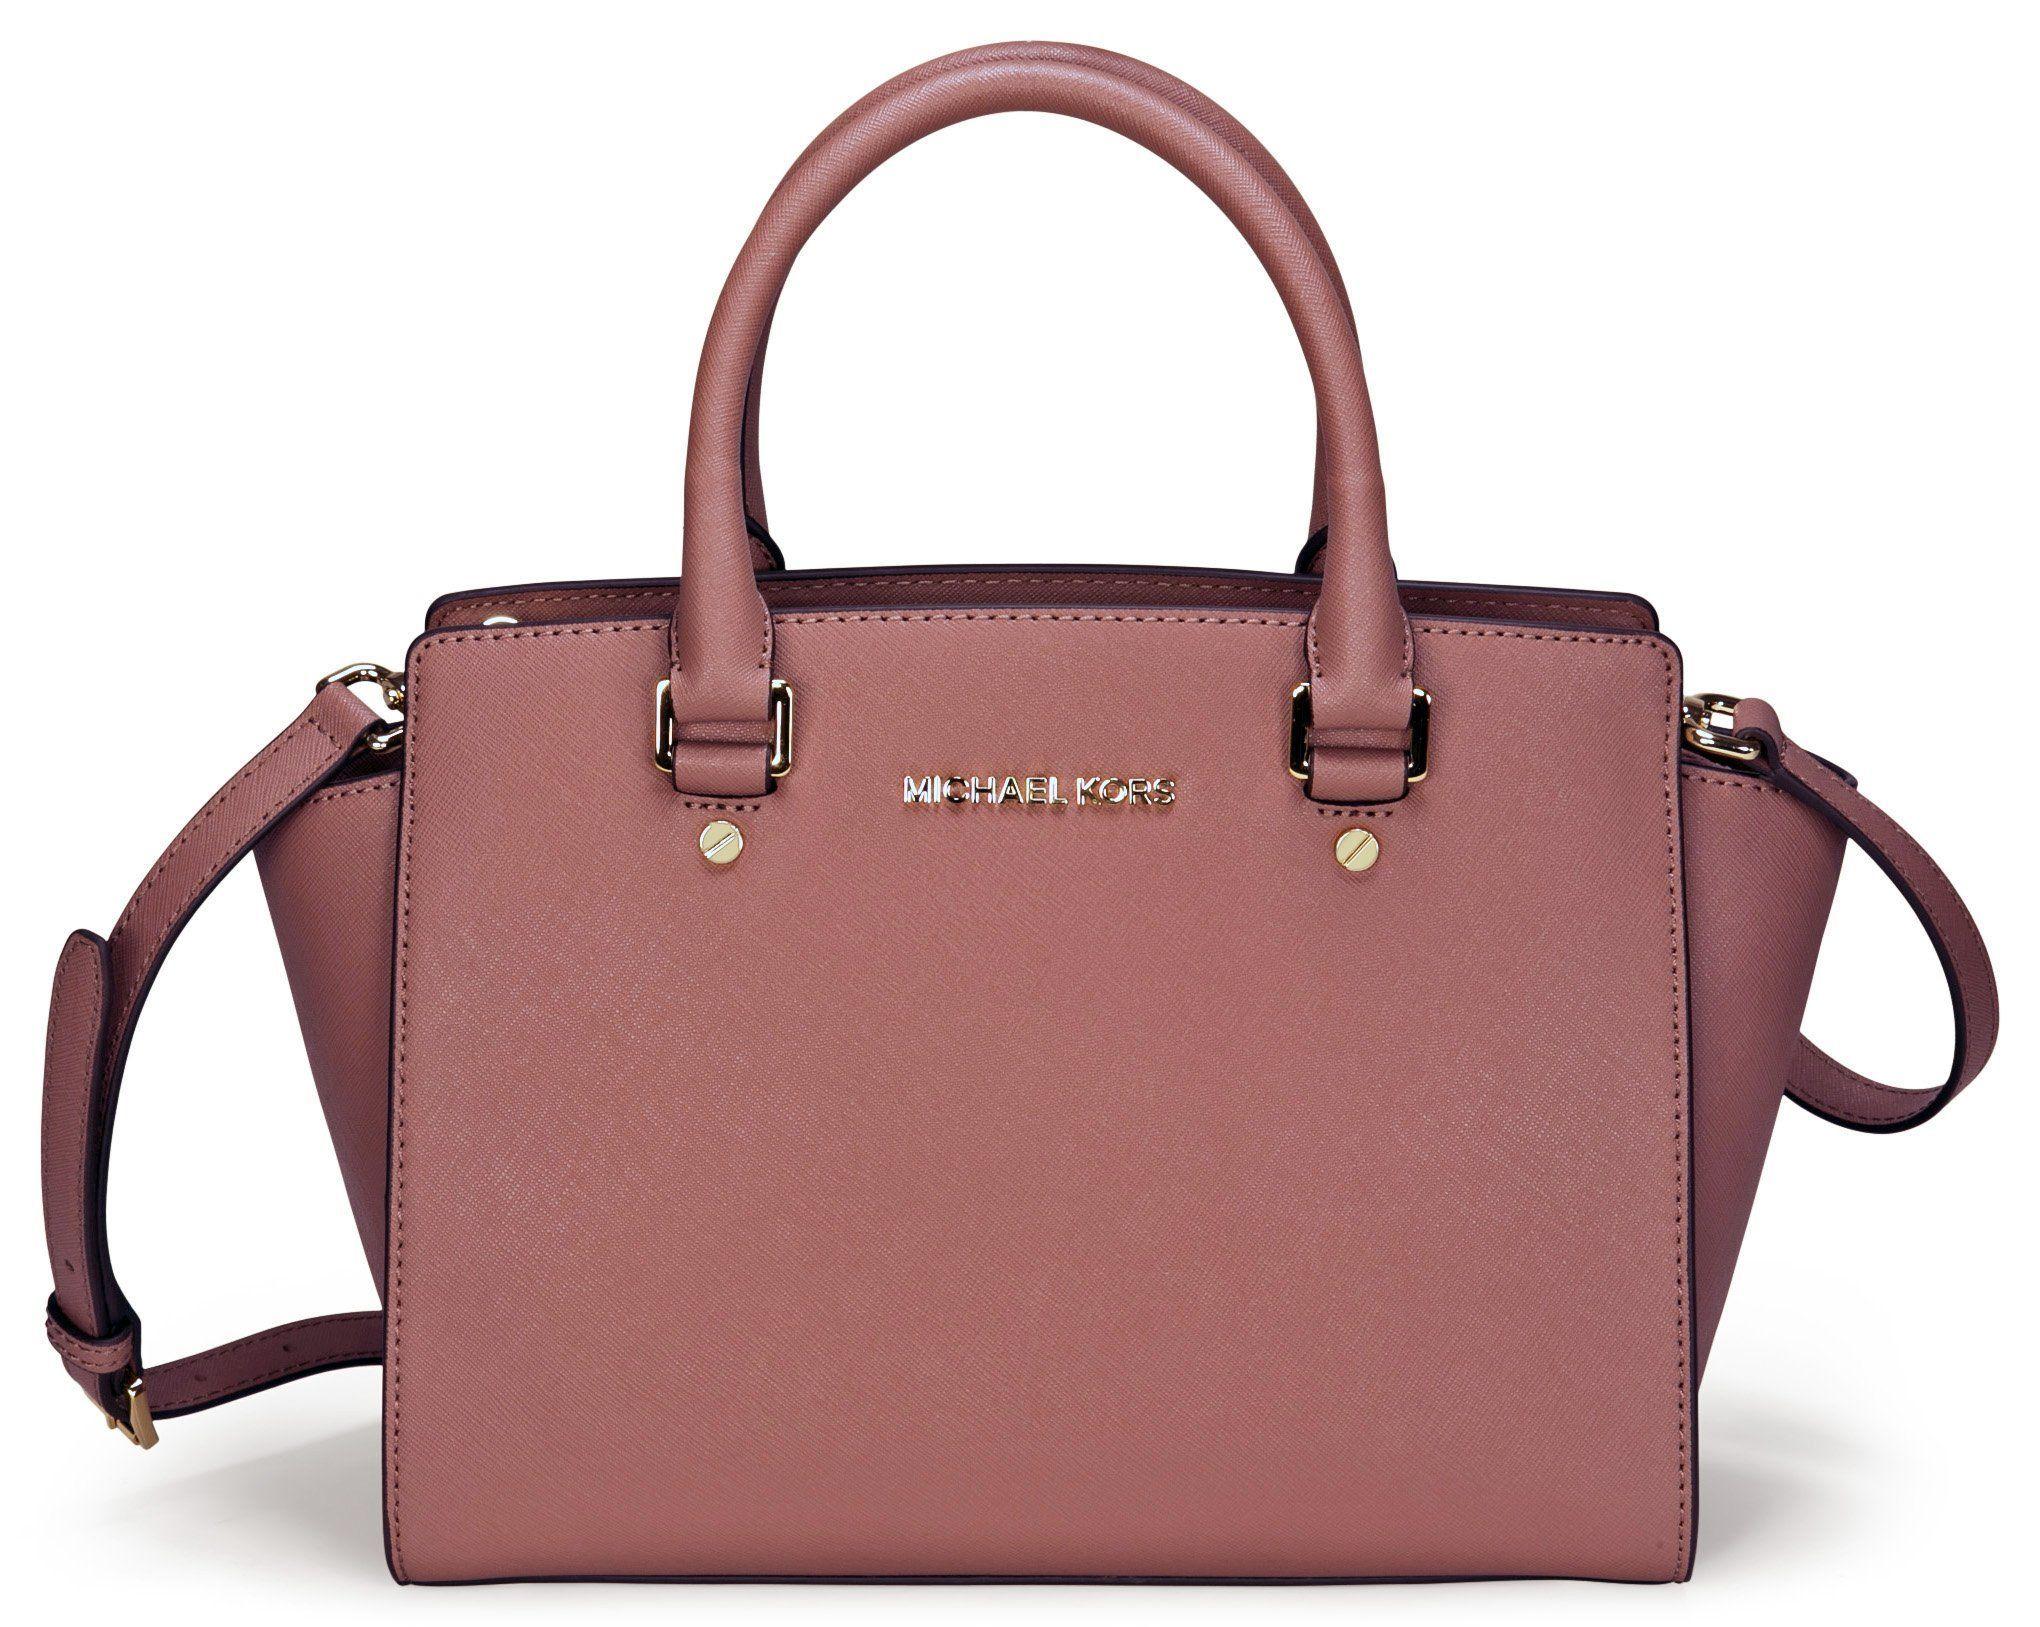 746cb3b023ed Michael Kors Selma Dusty Rose Medium Satchel Leather Handbag 30S3GLMS2L NEW